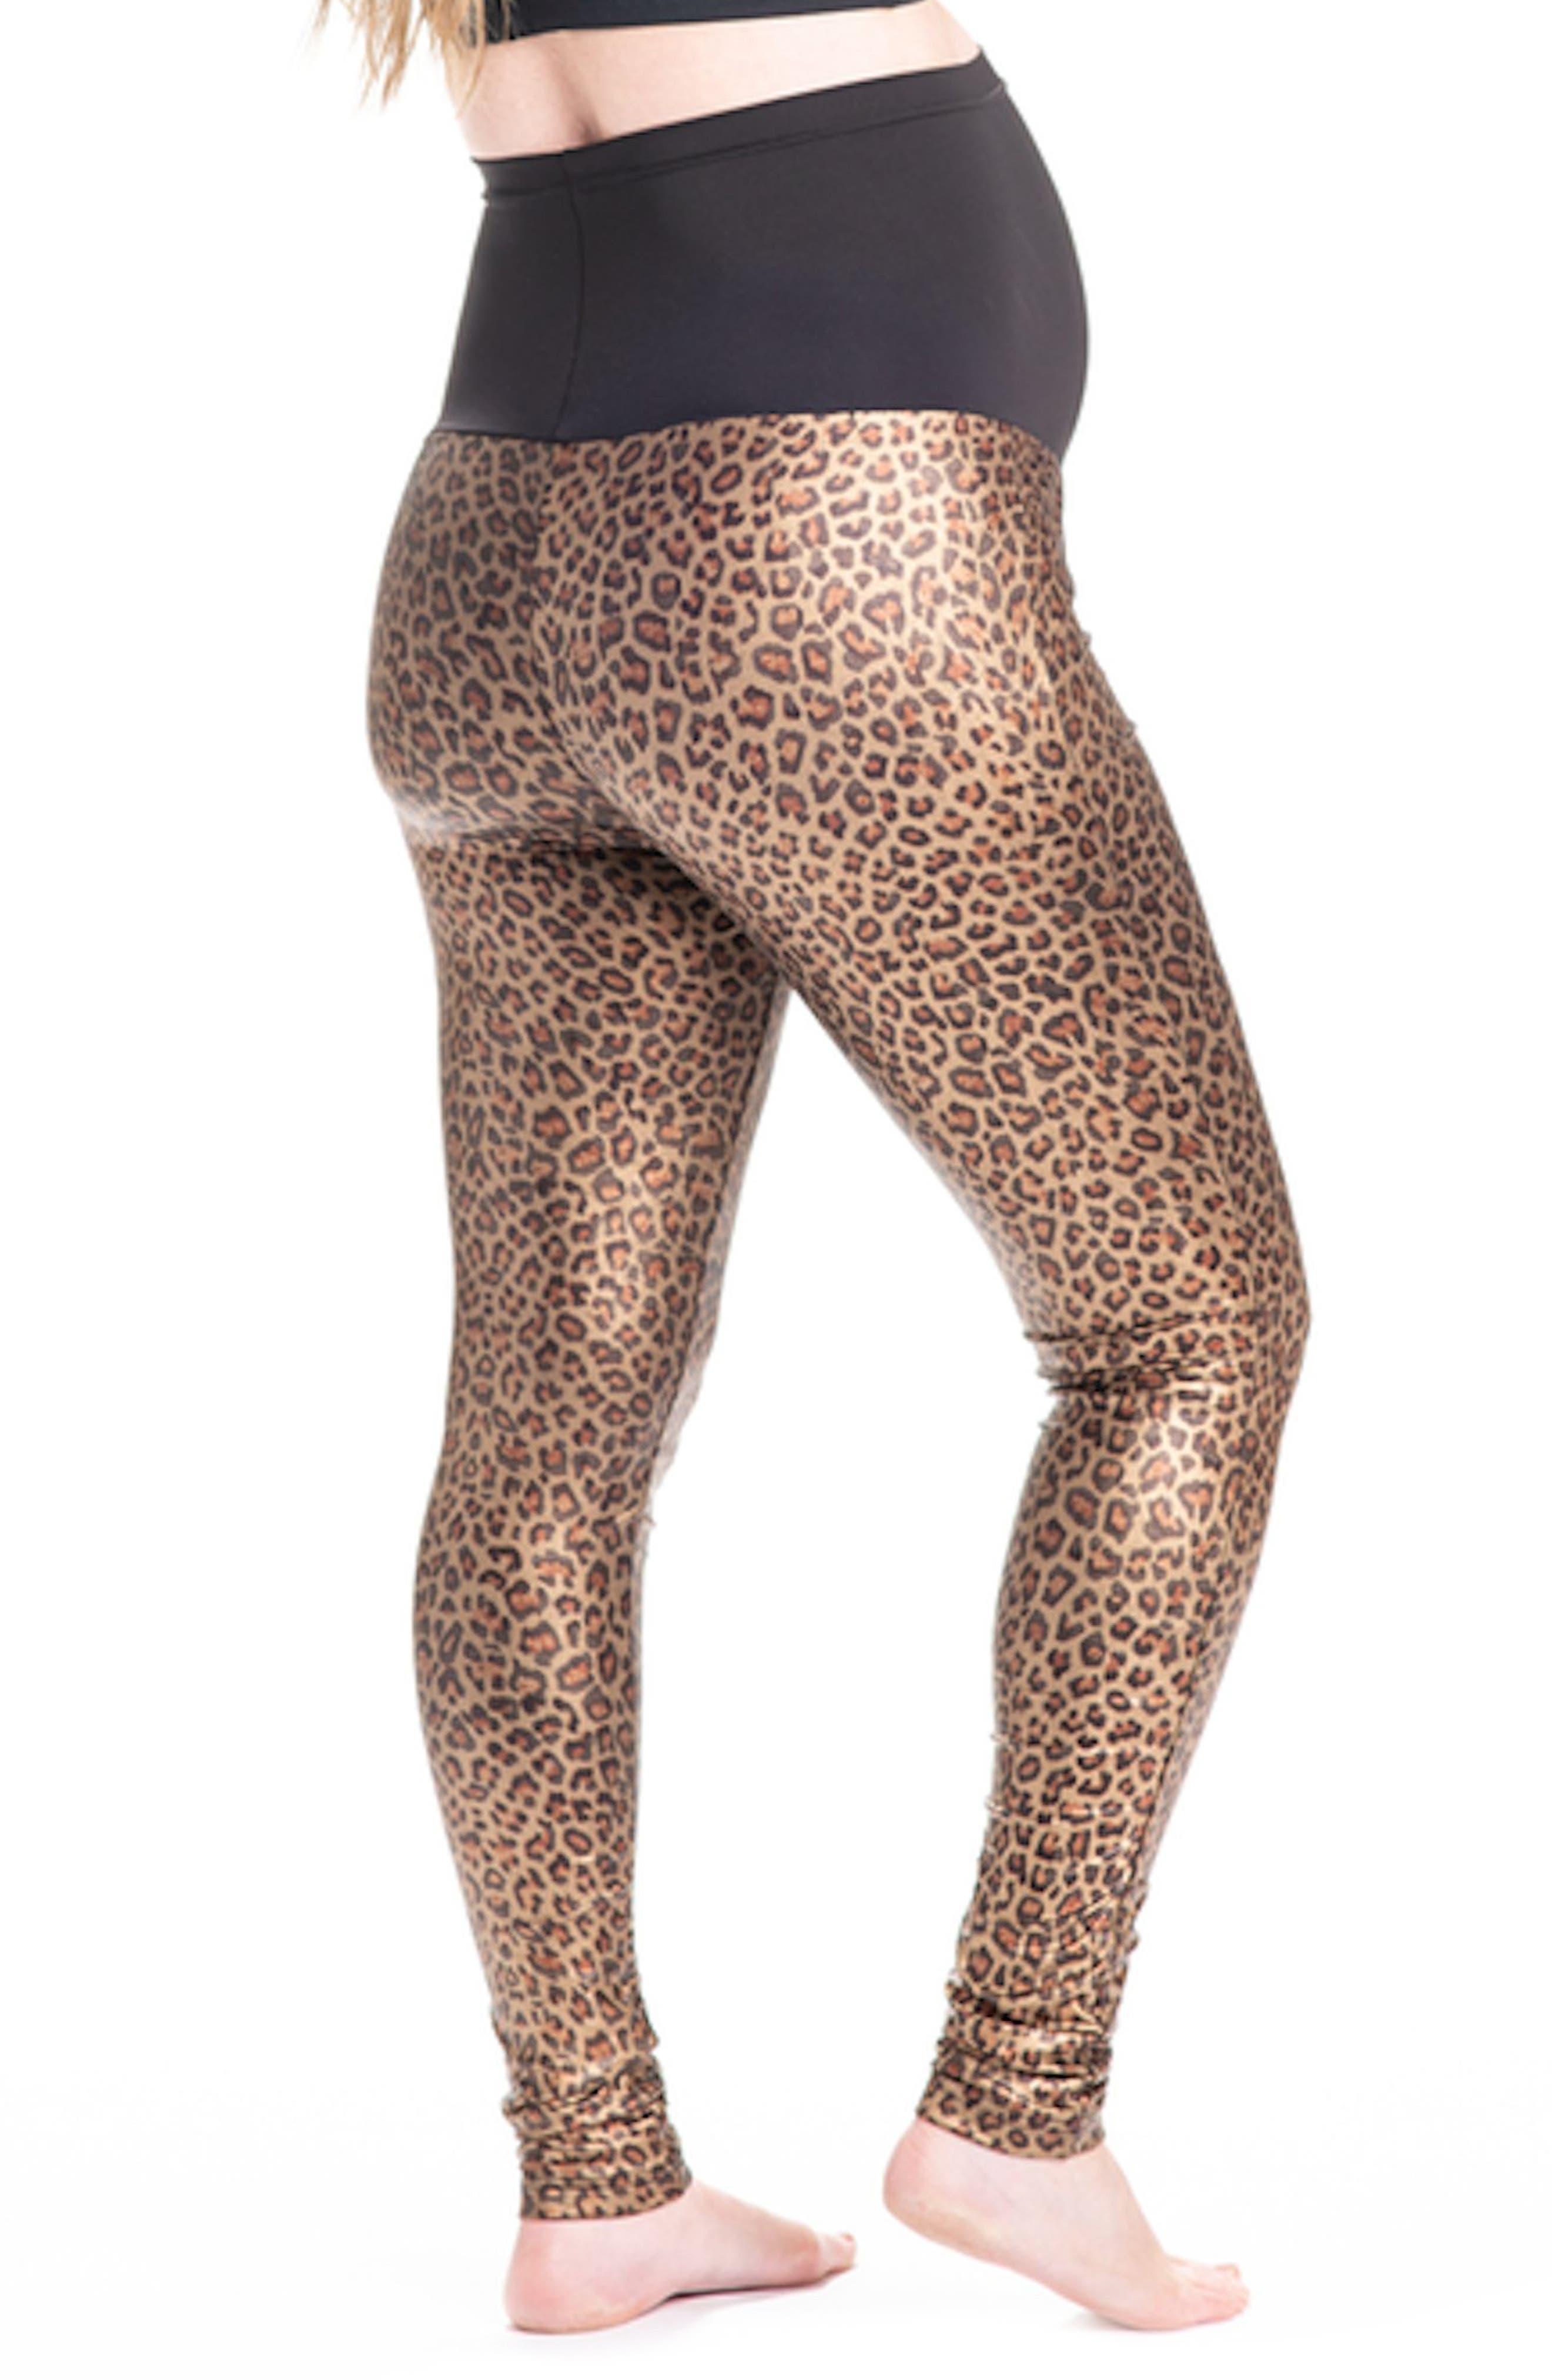 PREGGO LEGGINGS,                             Panthera Bae Maternity Leggings,                             Alternate thumbnail 2, color,                             GOLD